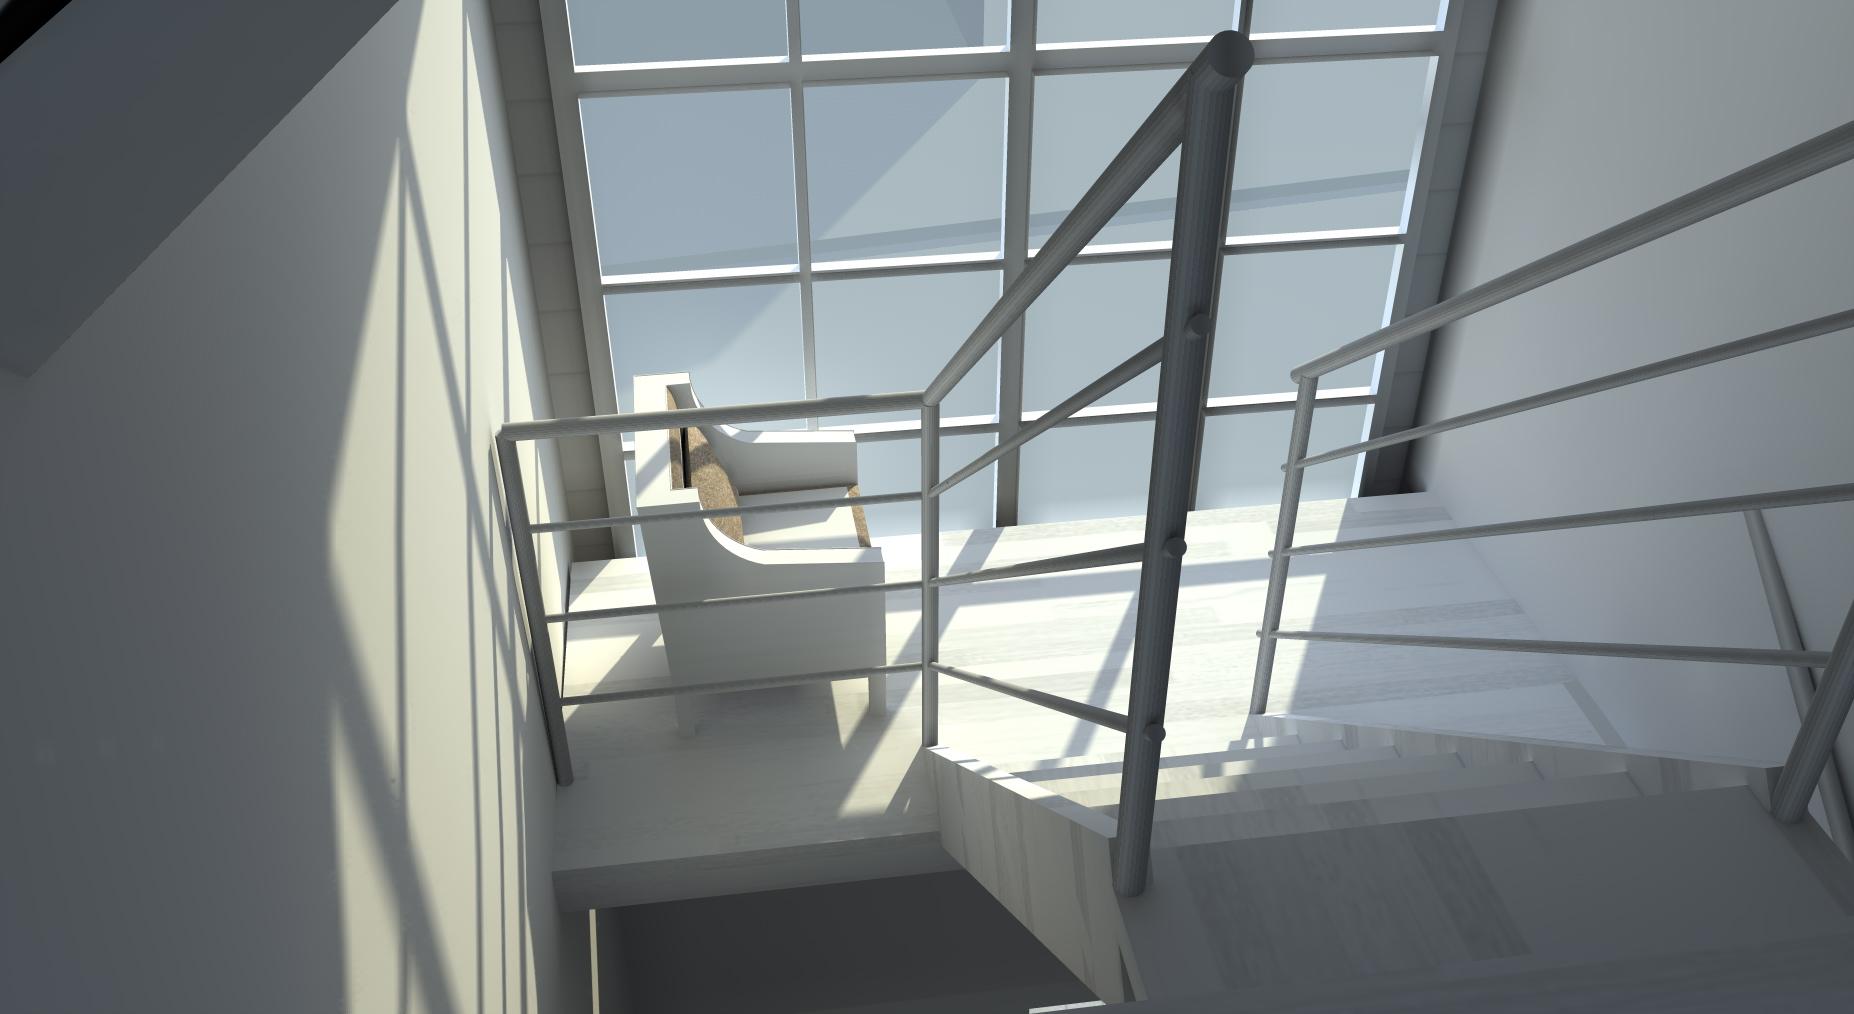 Uitbreiding voor extra woonoppervlakte eerste en tweede etage woning te eindhoven bttb helmig - Uitbreiding hal ...